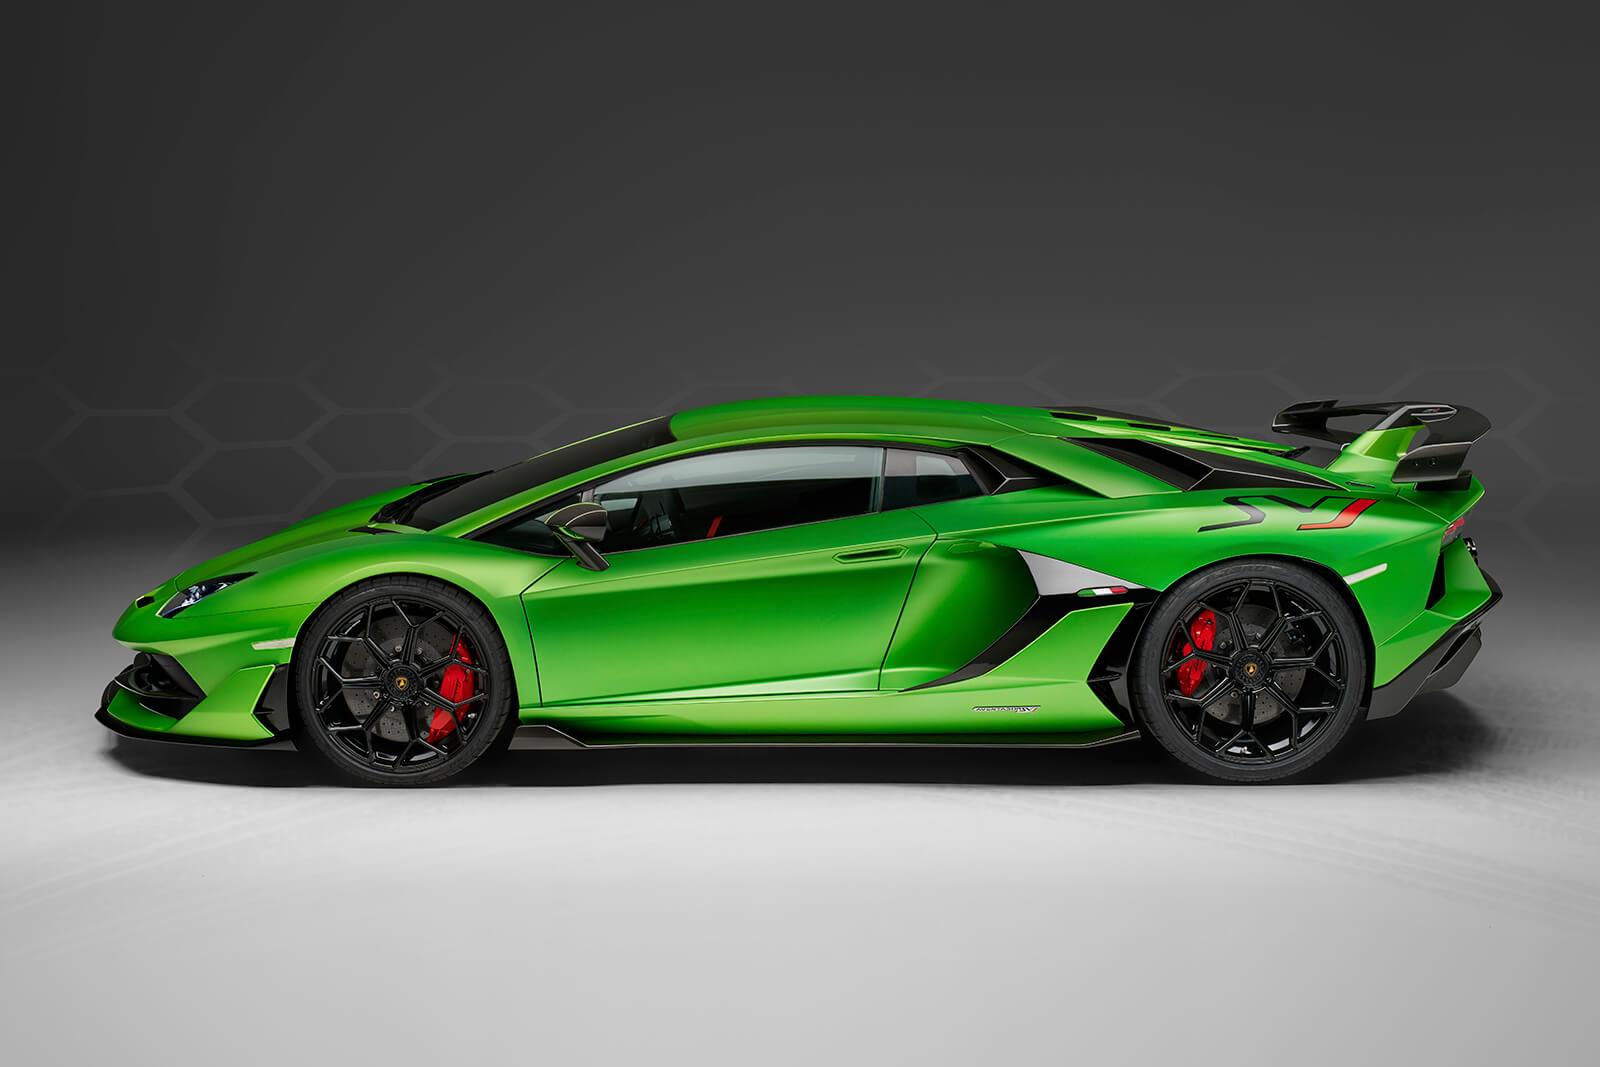 Lamborghini Unveils 770 Hp Aventador Svj 63 At Pebble Beach Oracle